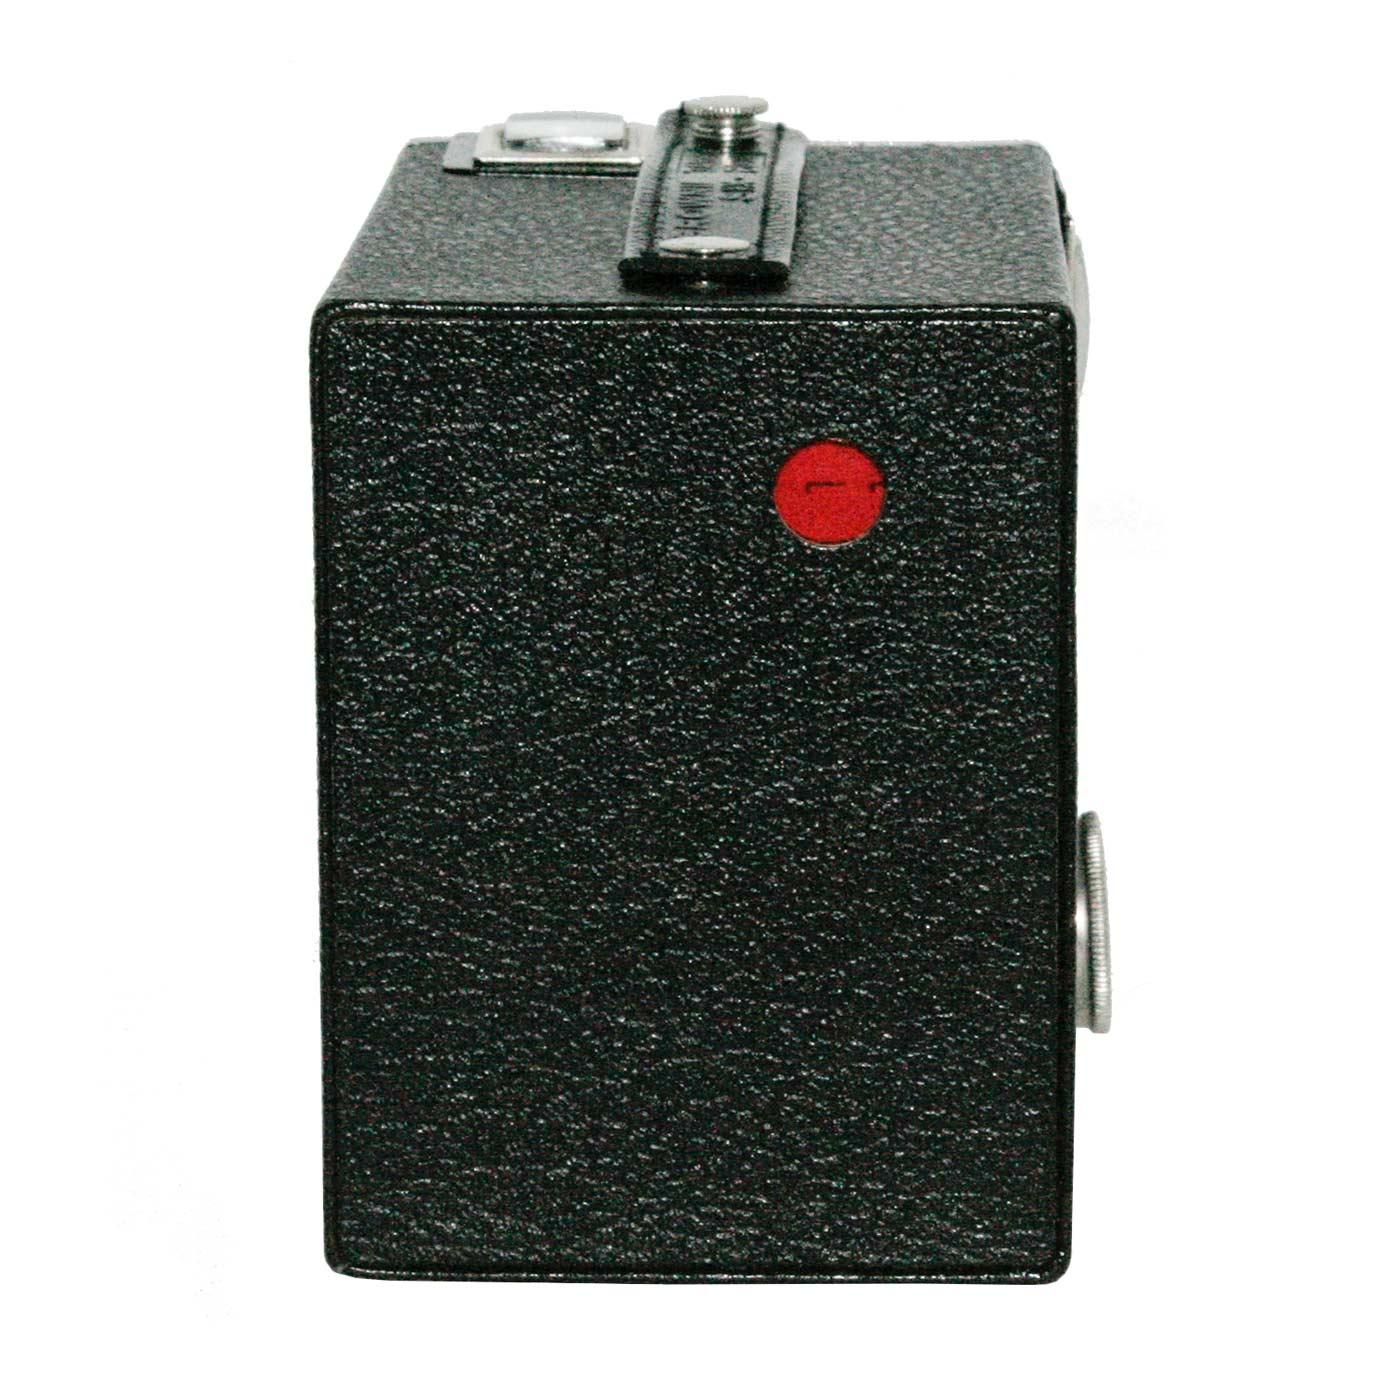 Kodak Brownie Target Six-20